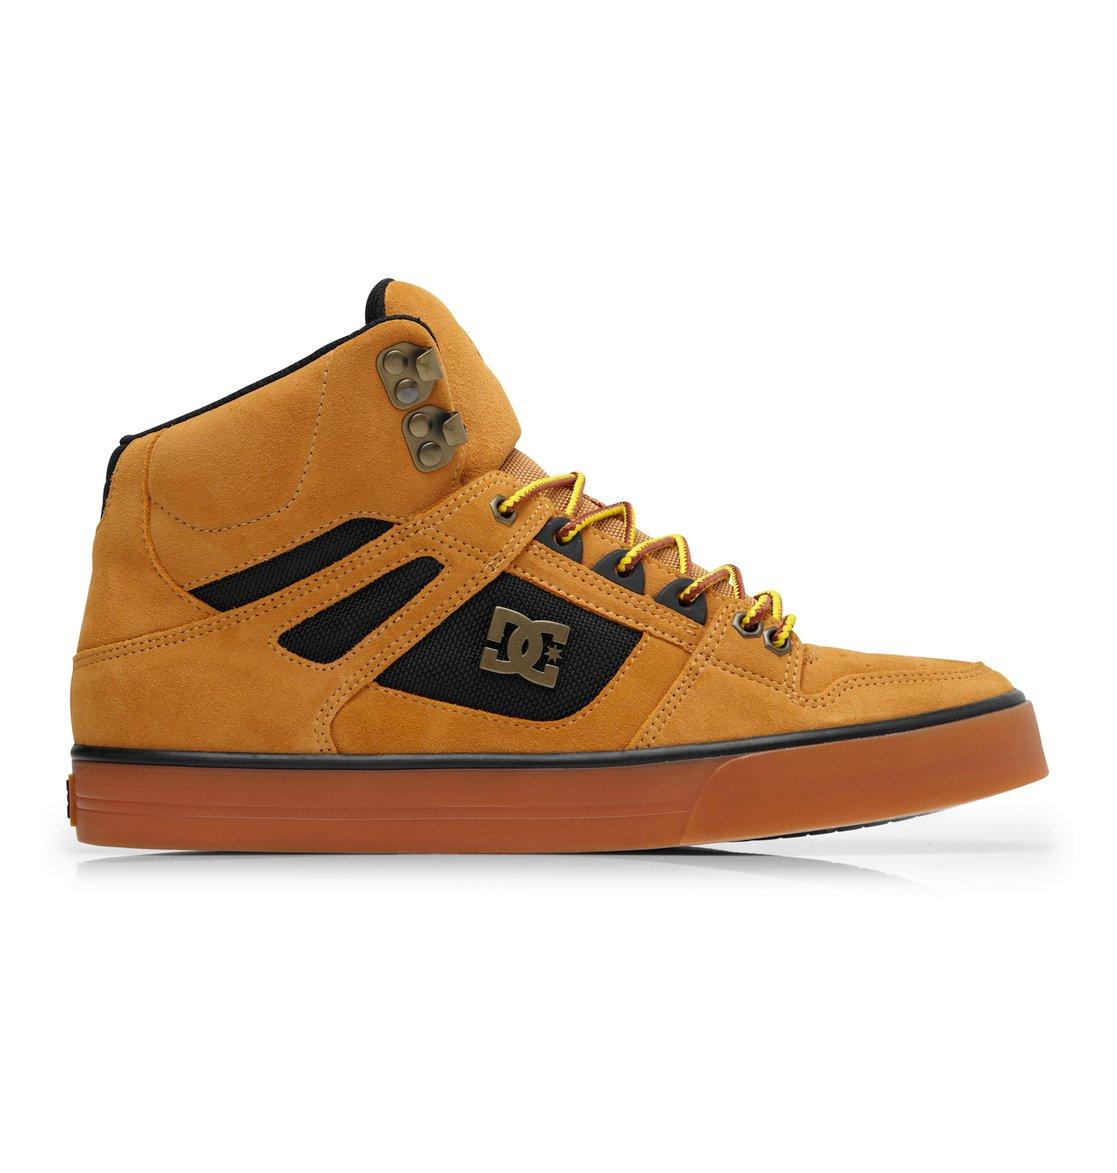 Mens Dc Shoes Spartan Hi Wc Wr Wheat